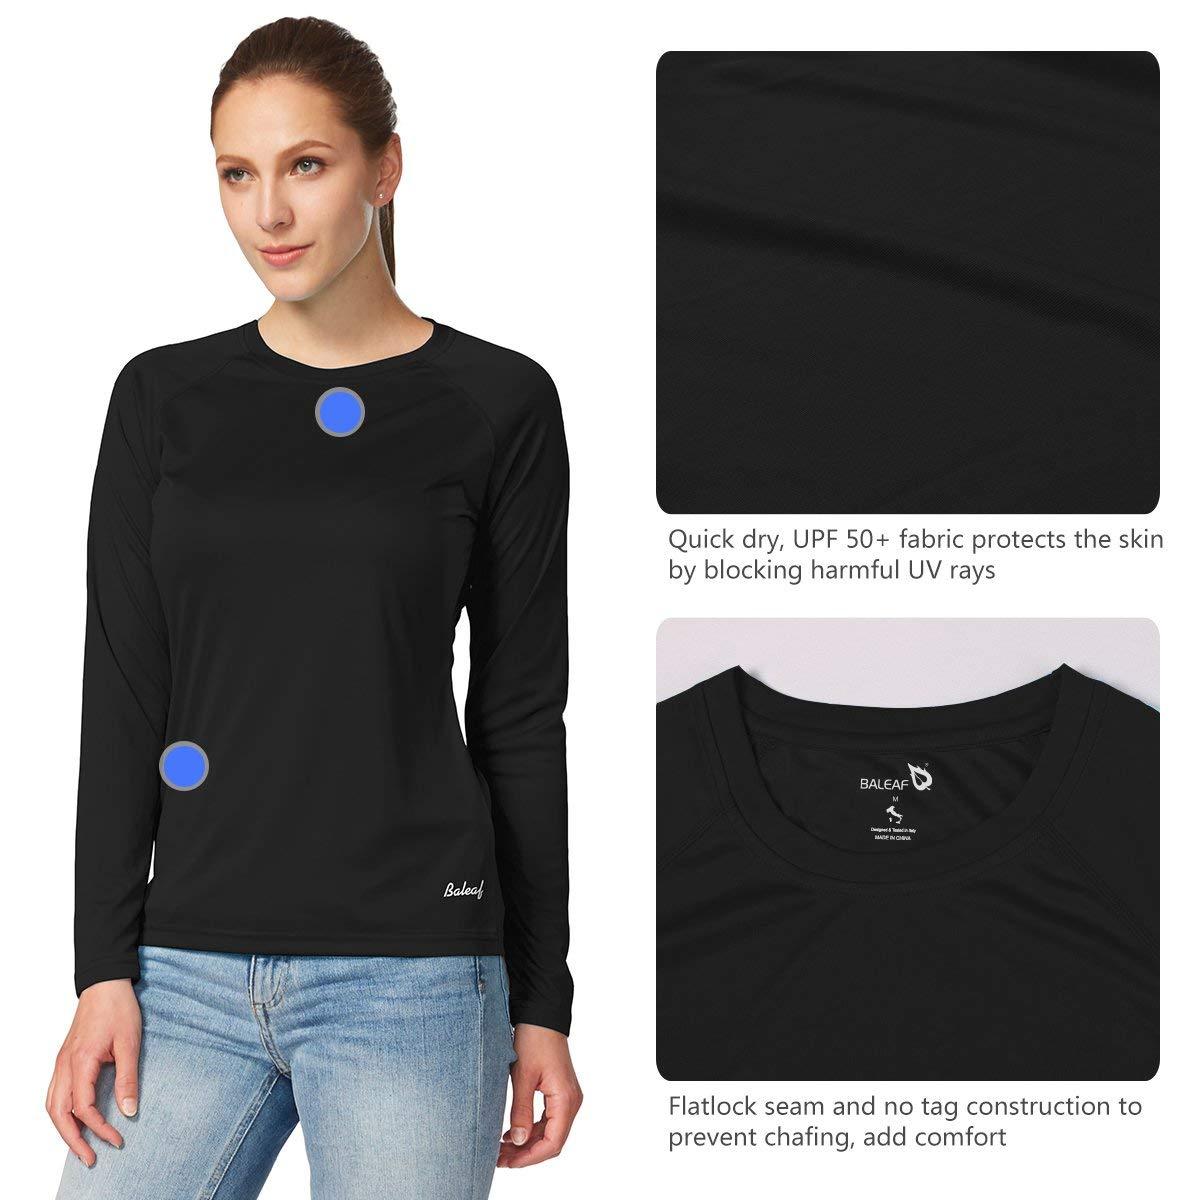 568e2658b Baleaf Women s UPF 50+ Sun Protection T-Shirt Long Short Sleeve Outdoor  Performance at Amazon Women s Clothing store